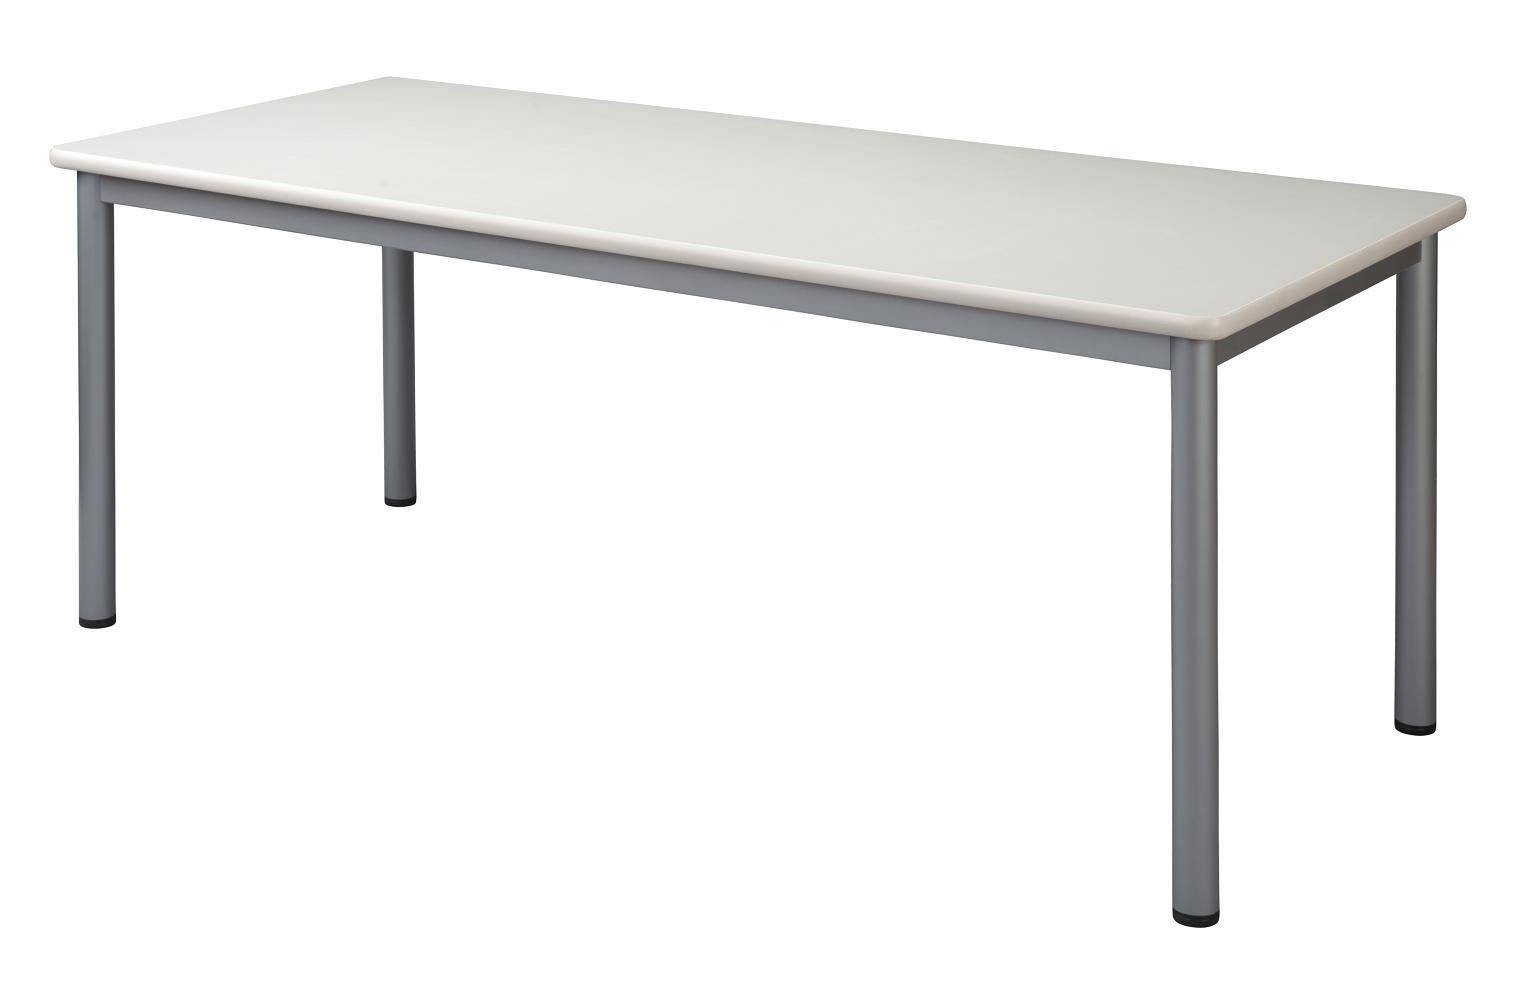 HITECHWOOD【ハイテクウッド】 ミーティングテーブル TL1875-NW ホワイト W1800xD750xH700mm